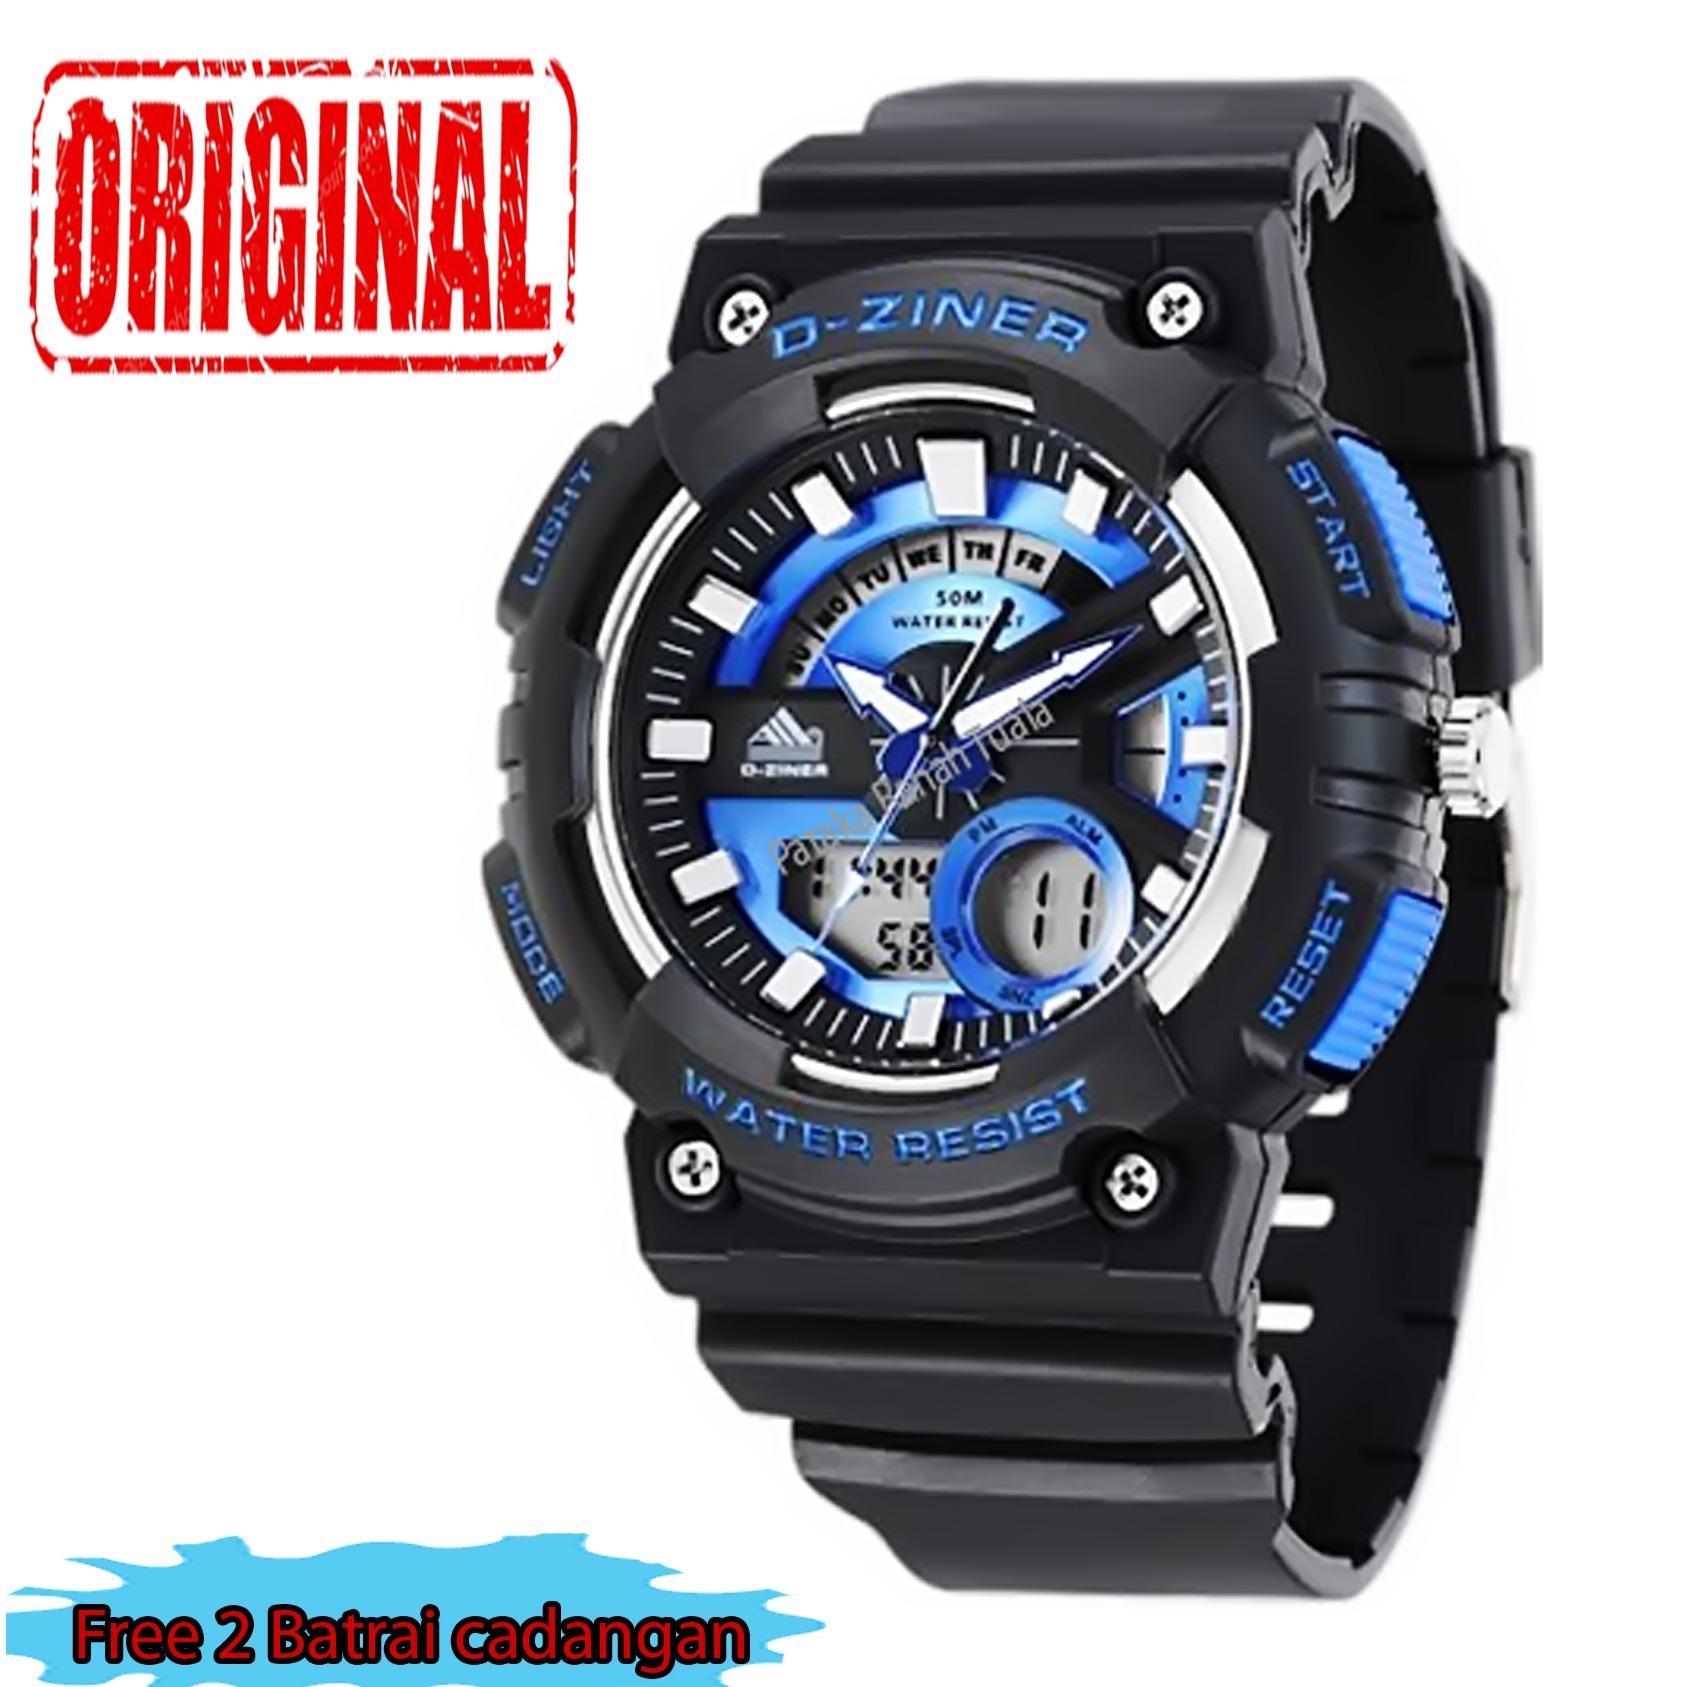 Cek Harga Baru Casio Dual Time Watch Jam Tangan Pria Hitam Strap ... 71349d91f8